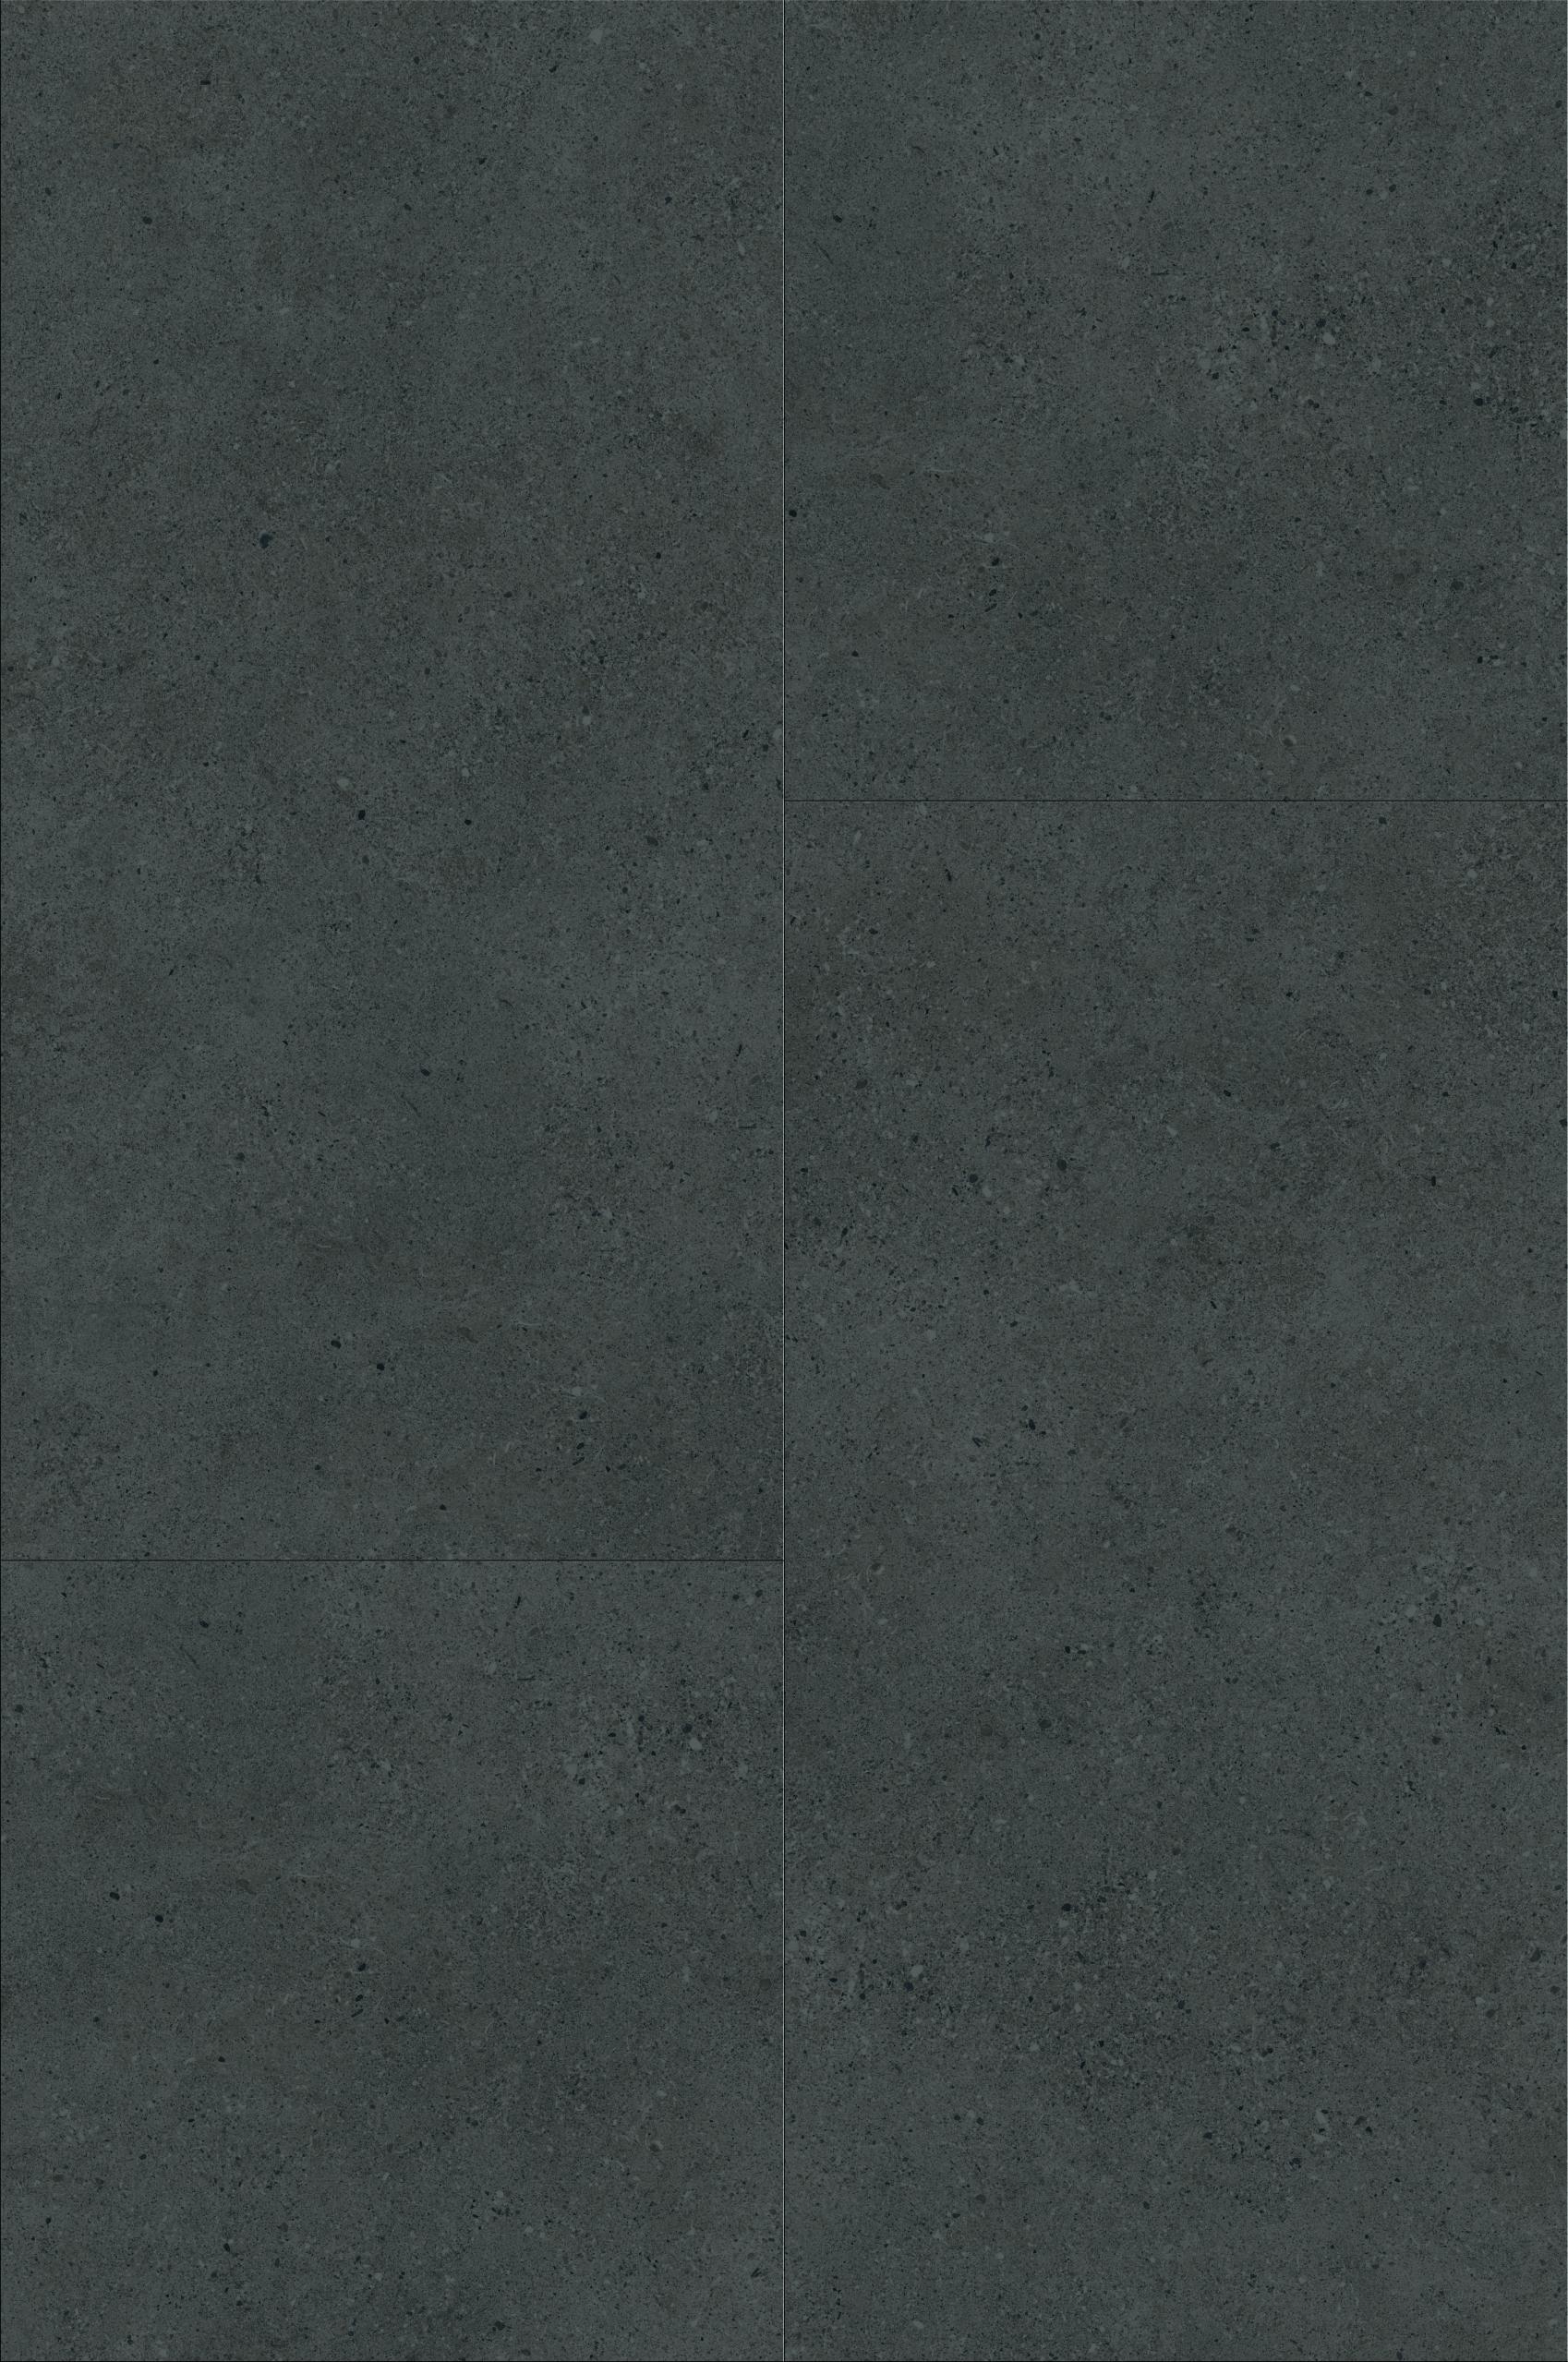 Vinylové podlahy Moduleo Select, Venetian Stone 46981